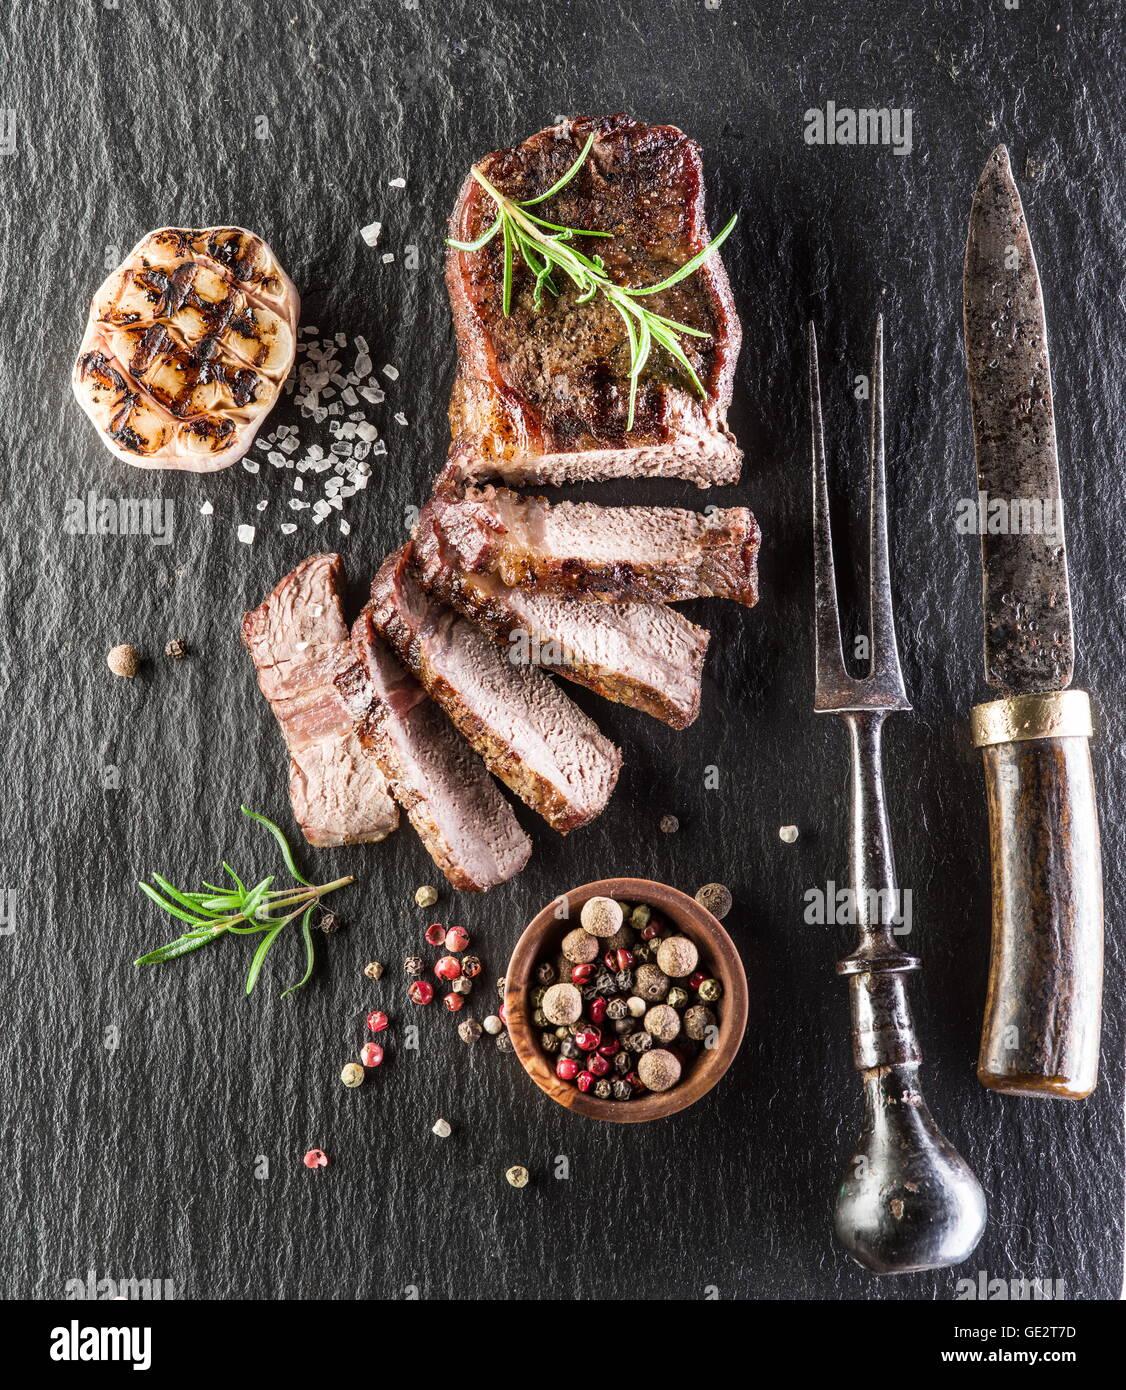 Rib Eye Steak con especias en la junta de grafito. Imagen De Stock